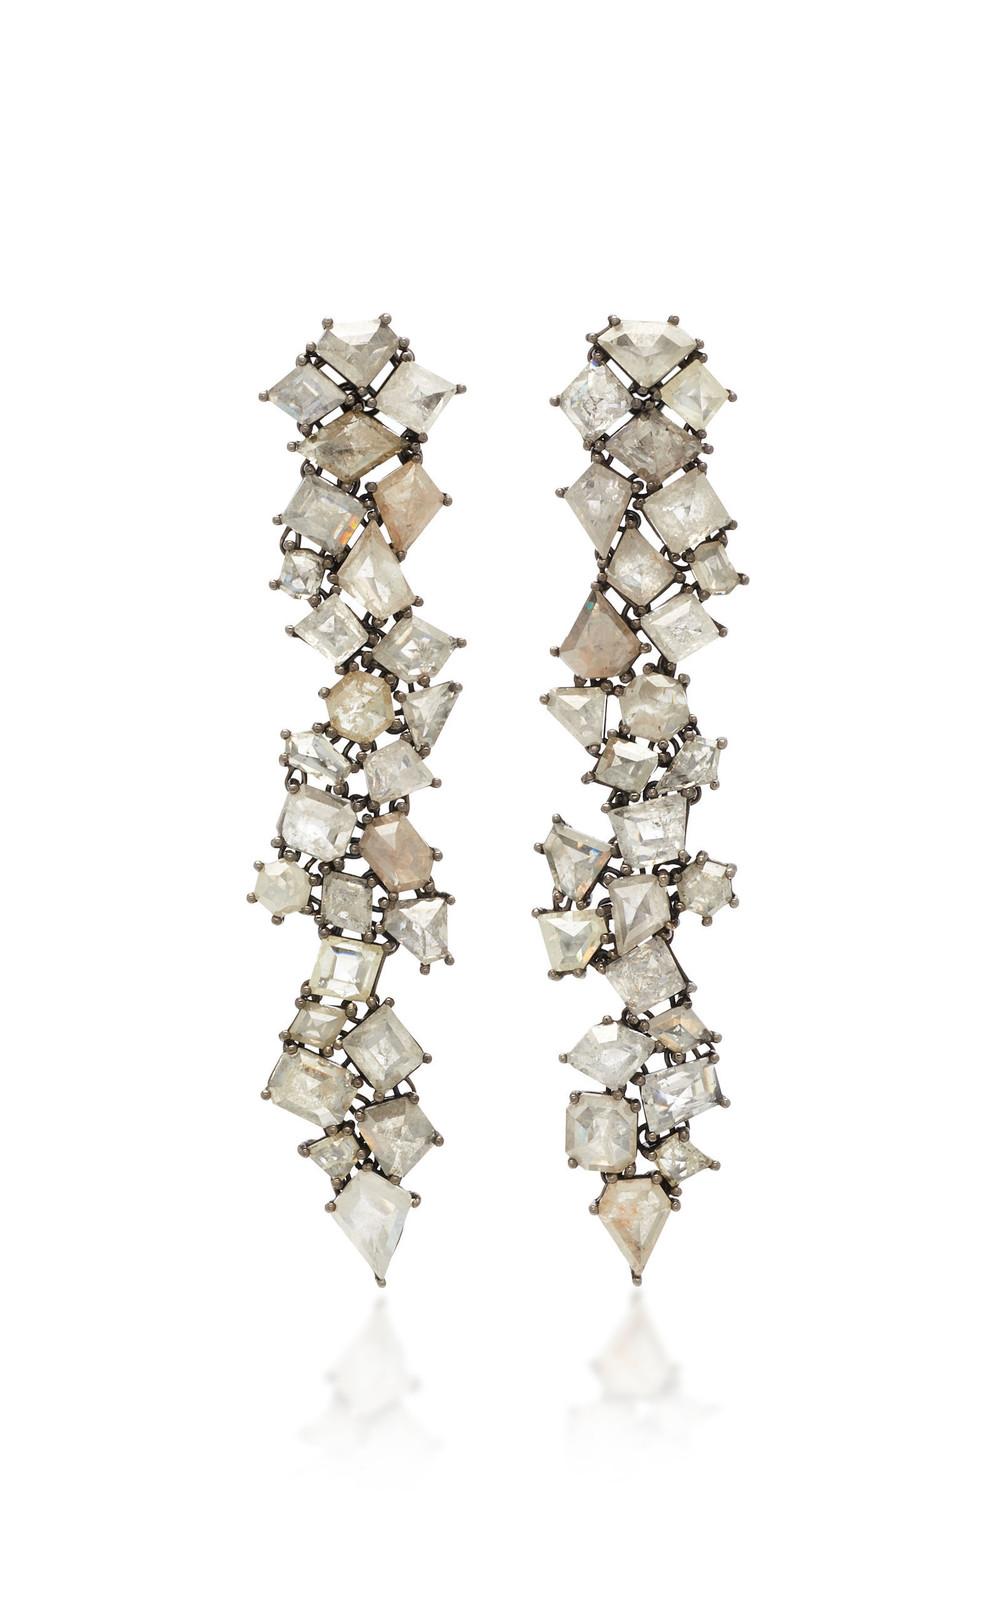 Sylva & Cie 18K White Gold Diamond Earrings in grey